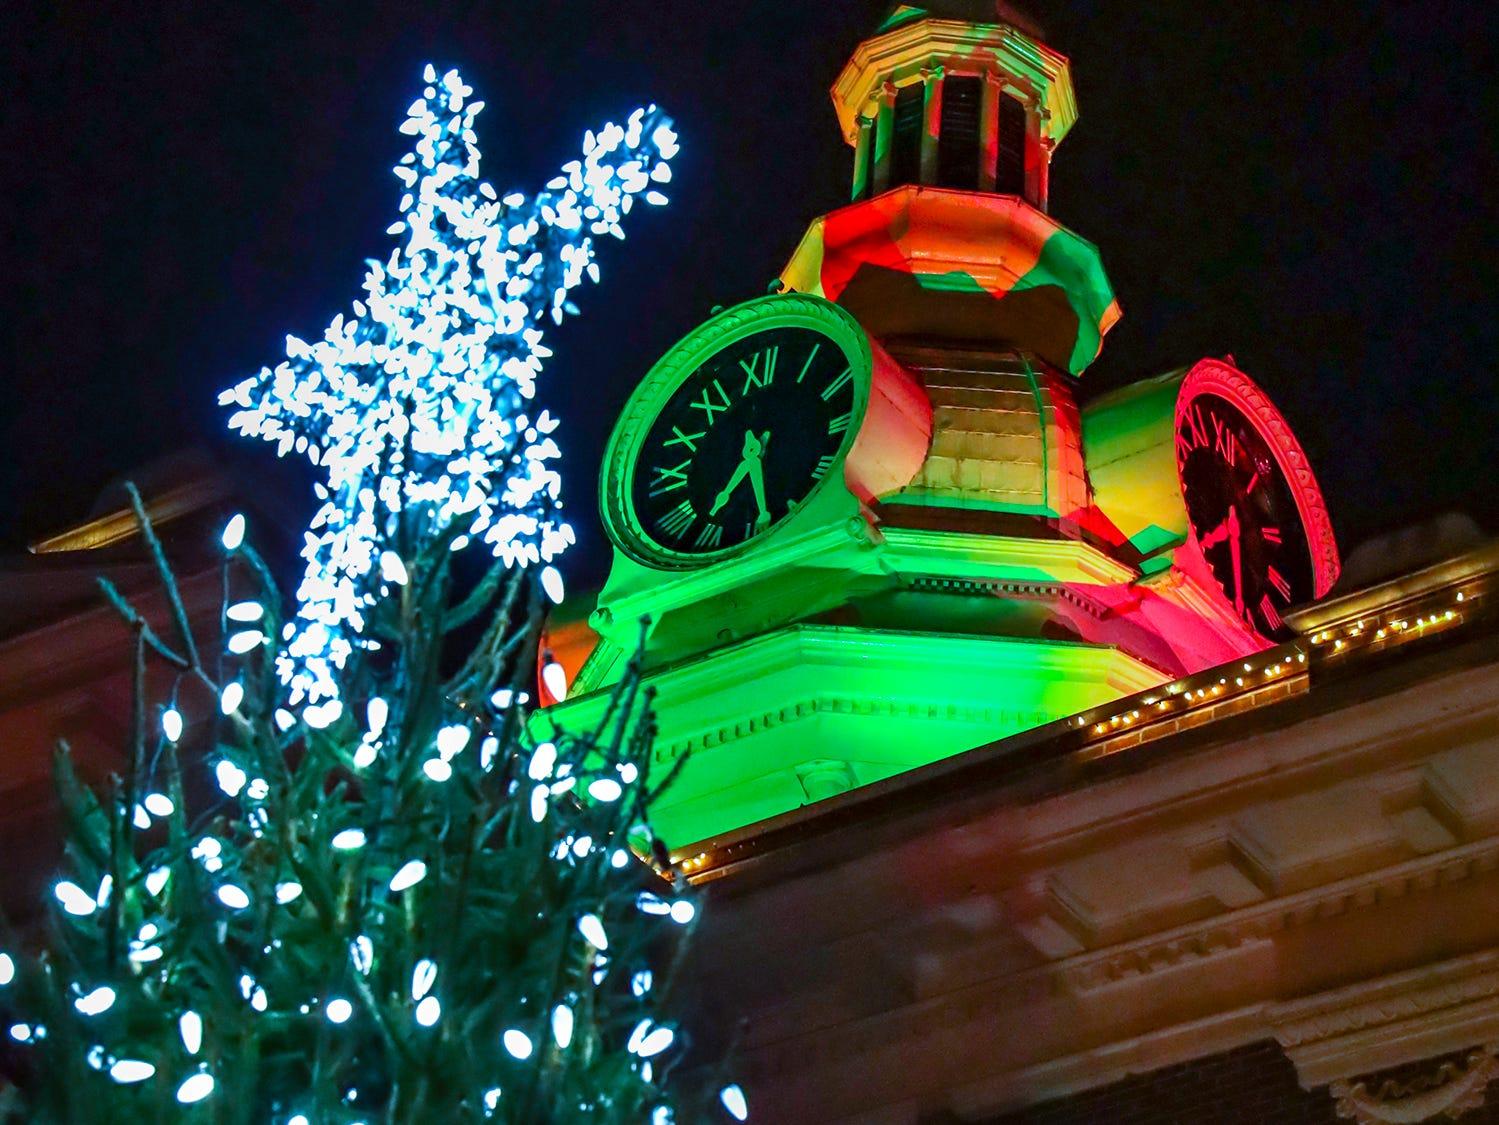 People gather for Main Street Murfreesboro's annual Christmas tree lighting on Friday, December 7, 2018, in Murfreesboro, Tenn.